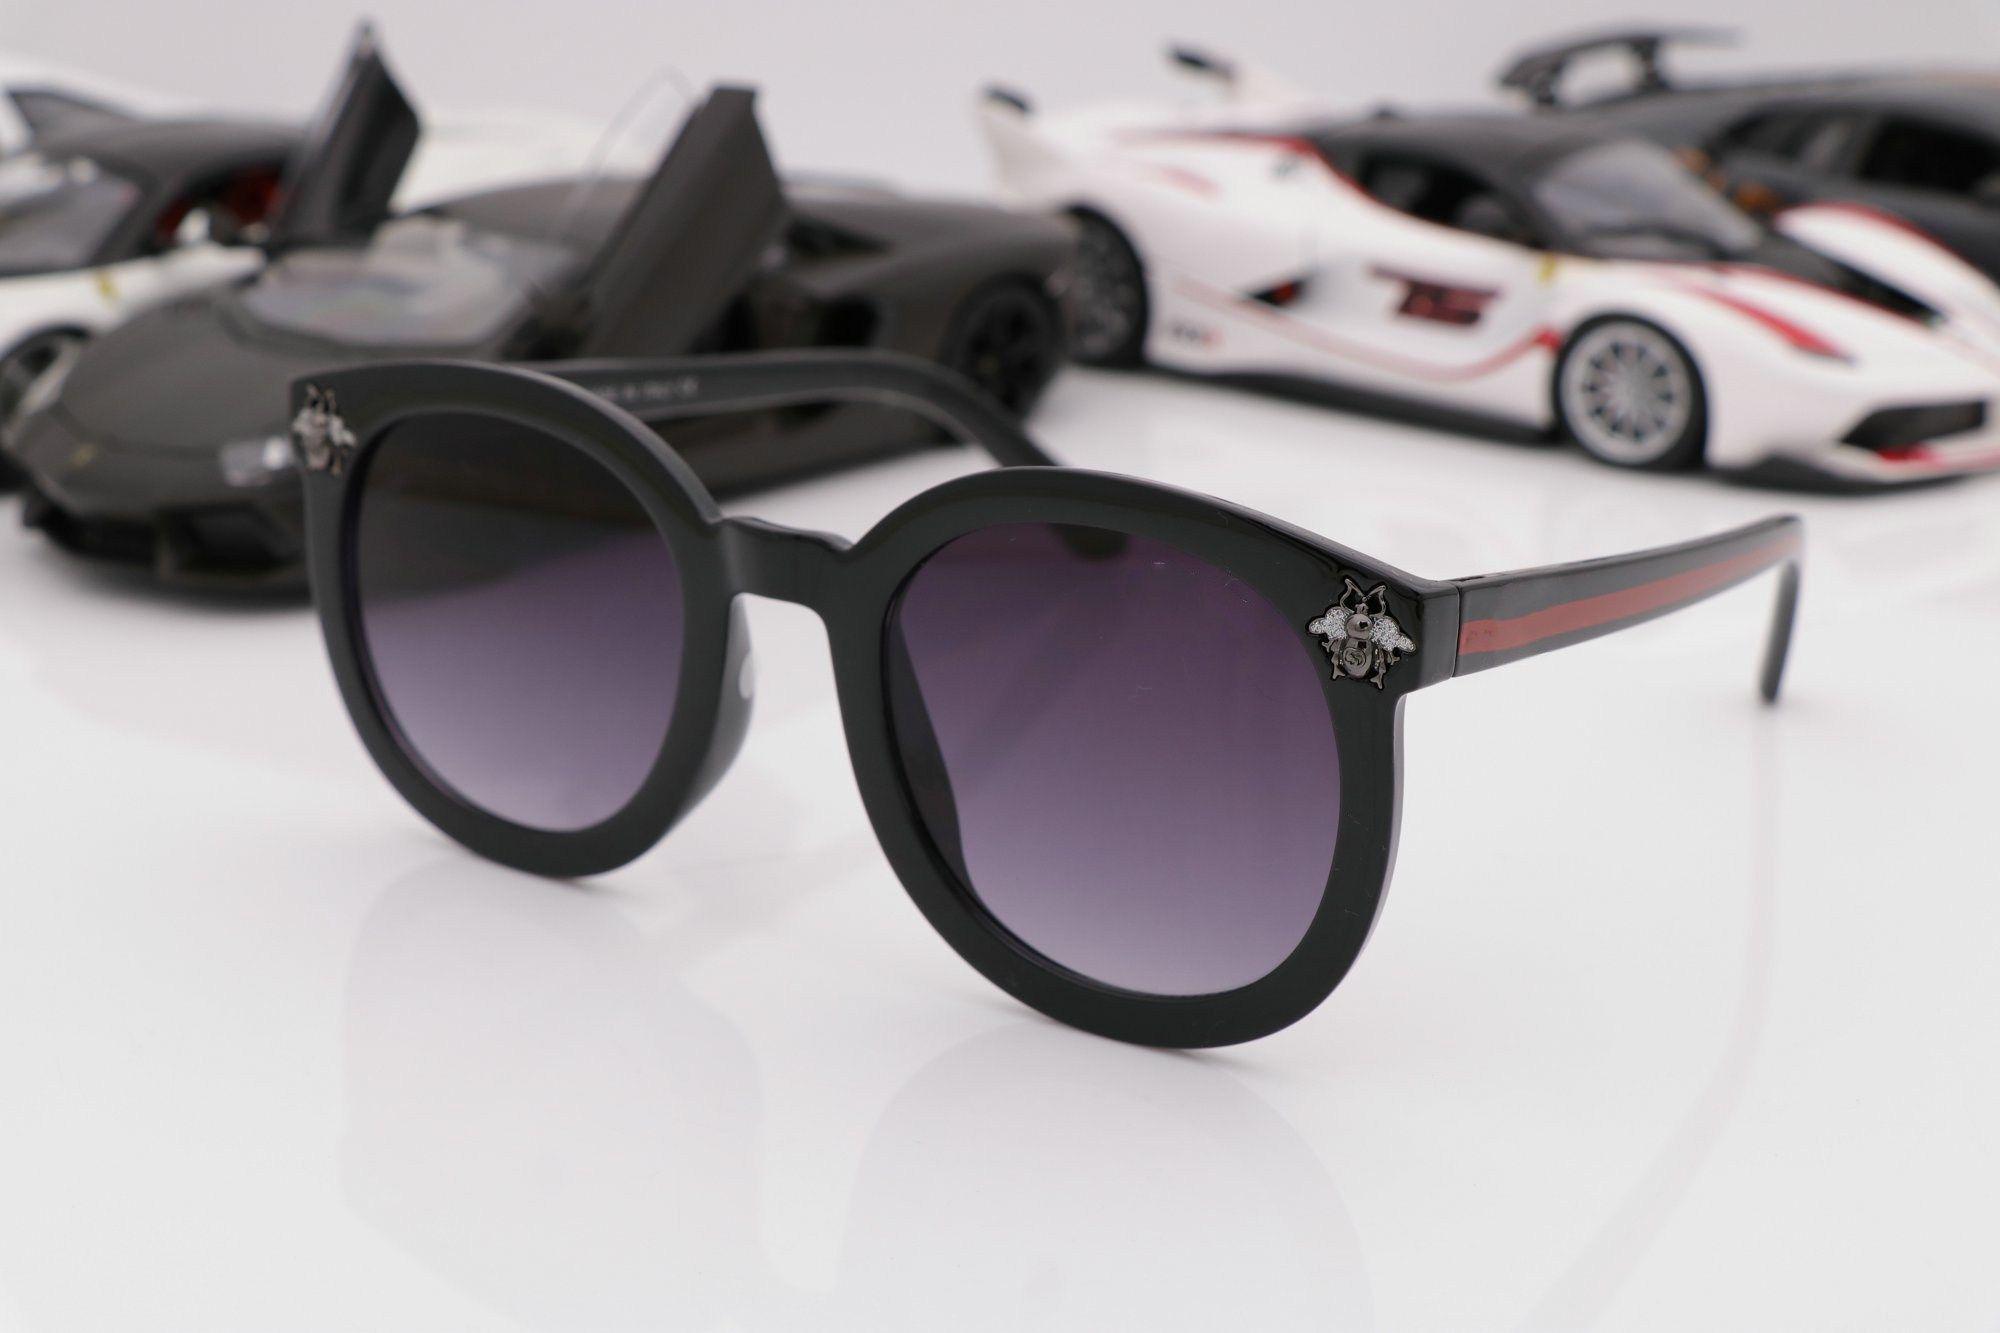 1d1732949eec Fashion Style Women  S Men Designer Sunglasses 10231 Pilot Classic Vintage  Frame UV400 Top Quality Protection Eyewear With Original BOX Foster Grant  ...